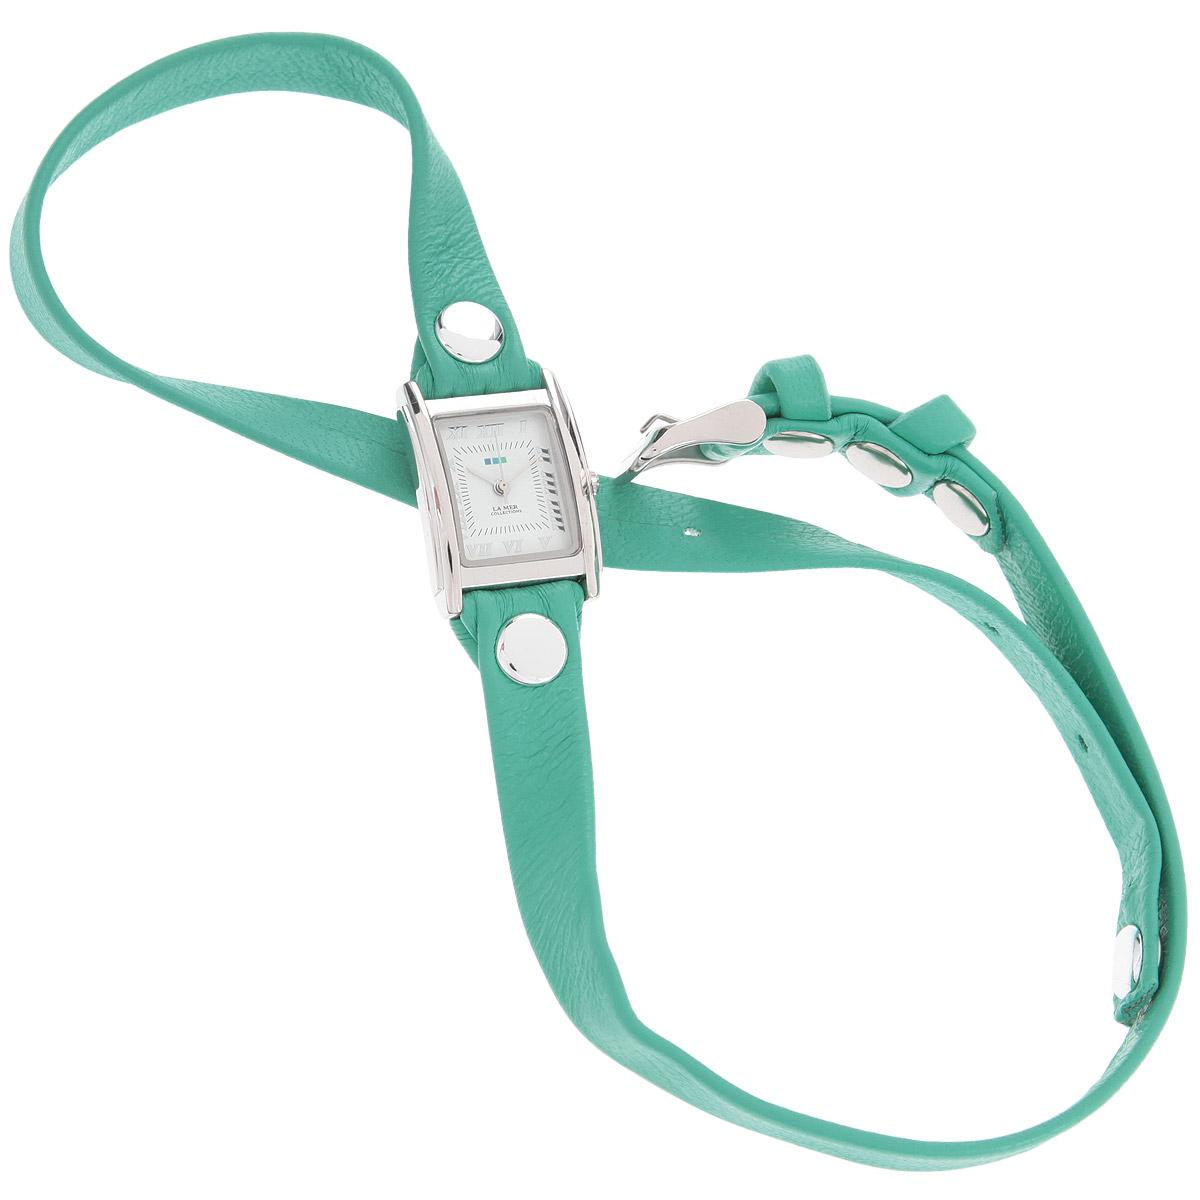 "Часы наручные женские La Mer Collections ""Simple Mint Silver"". LMSTW9003x ( LMSTW9003x )"